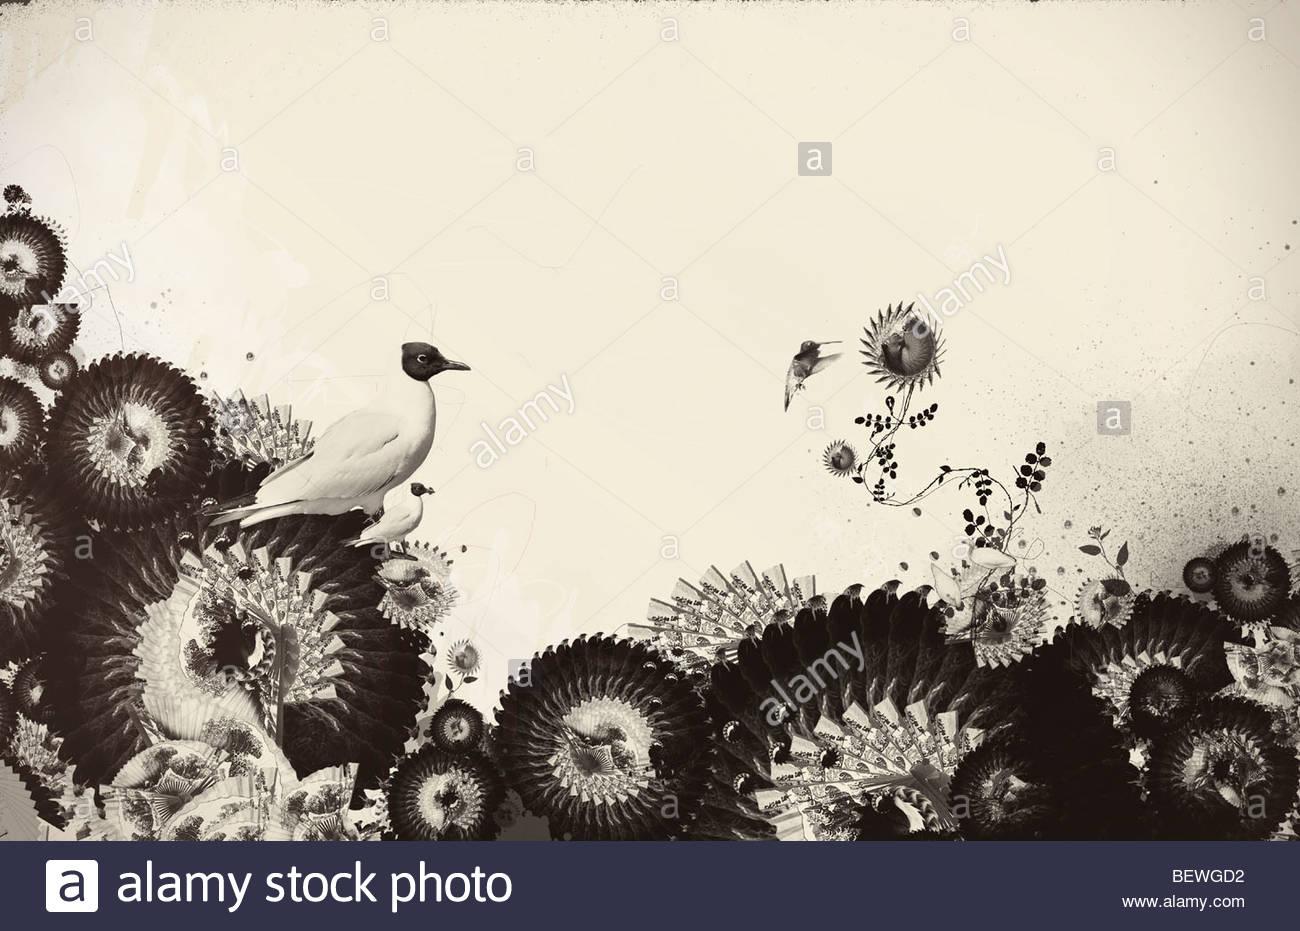 Bird and decorative flowers - Stock Image